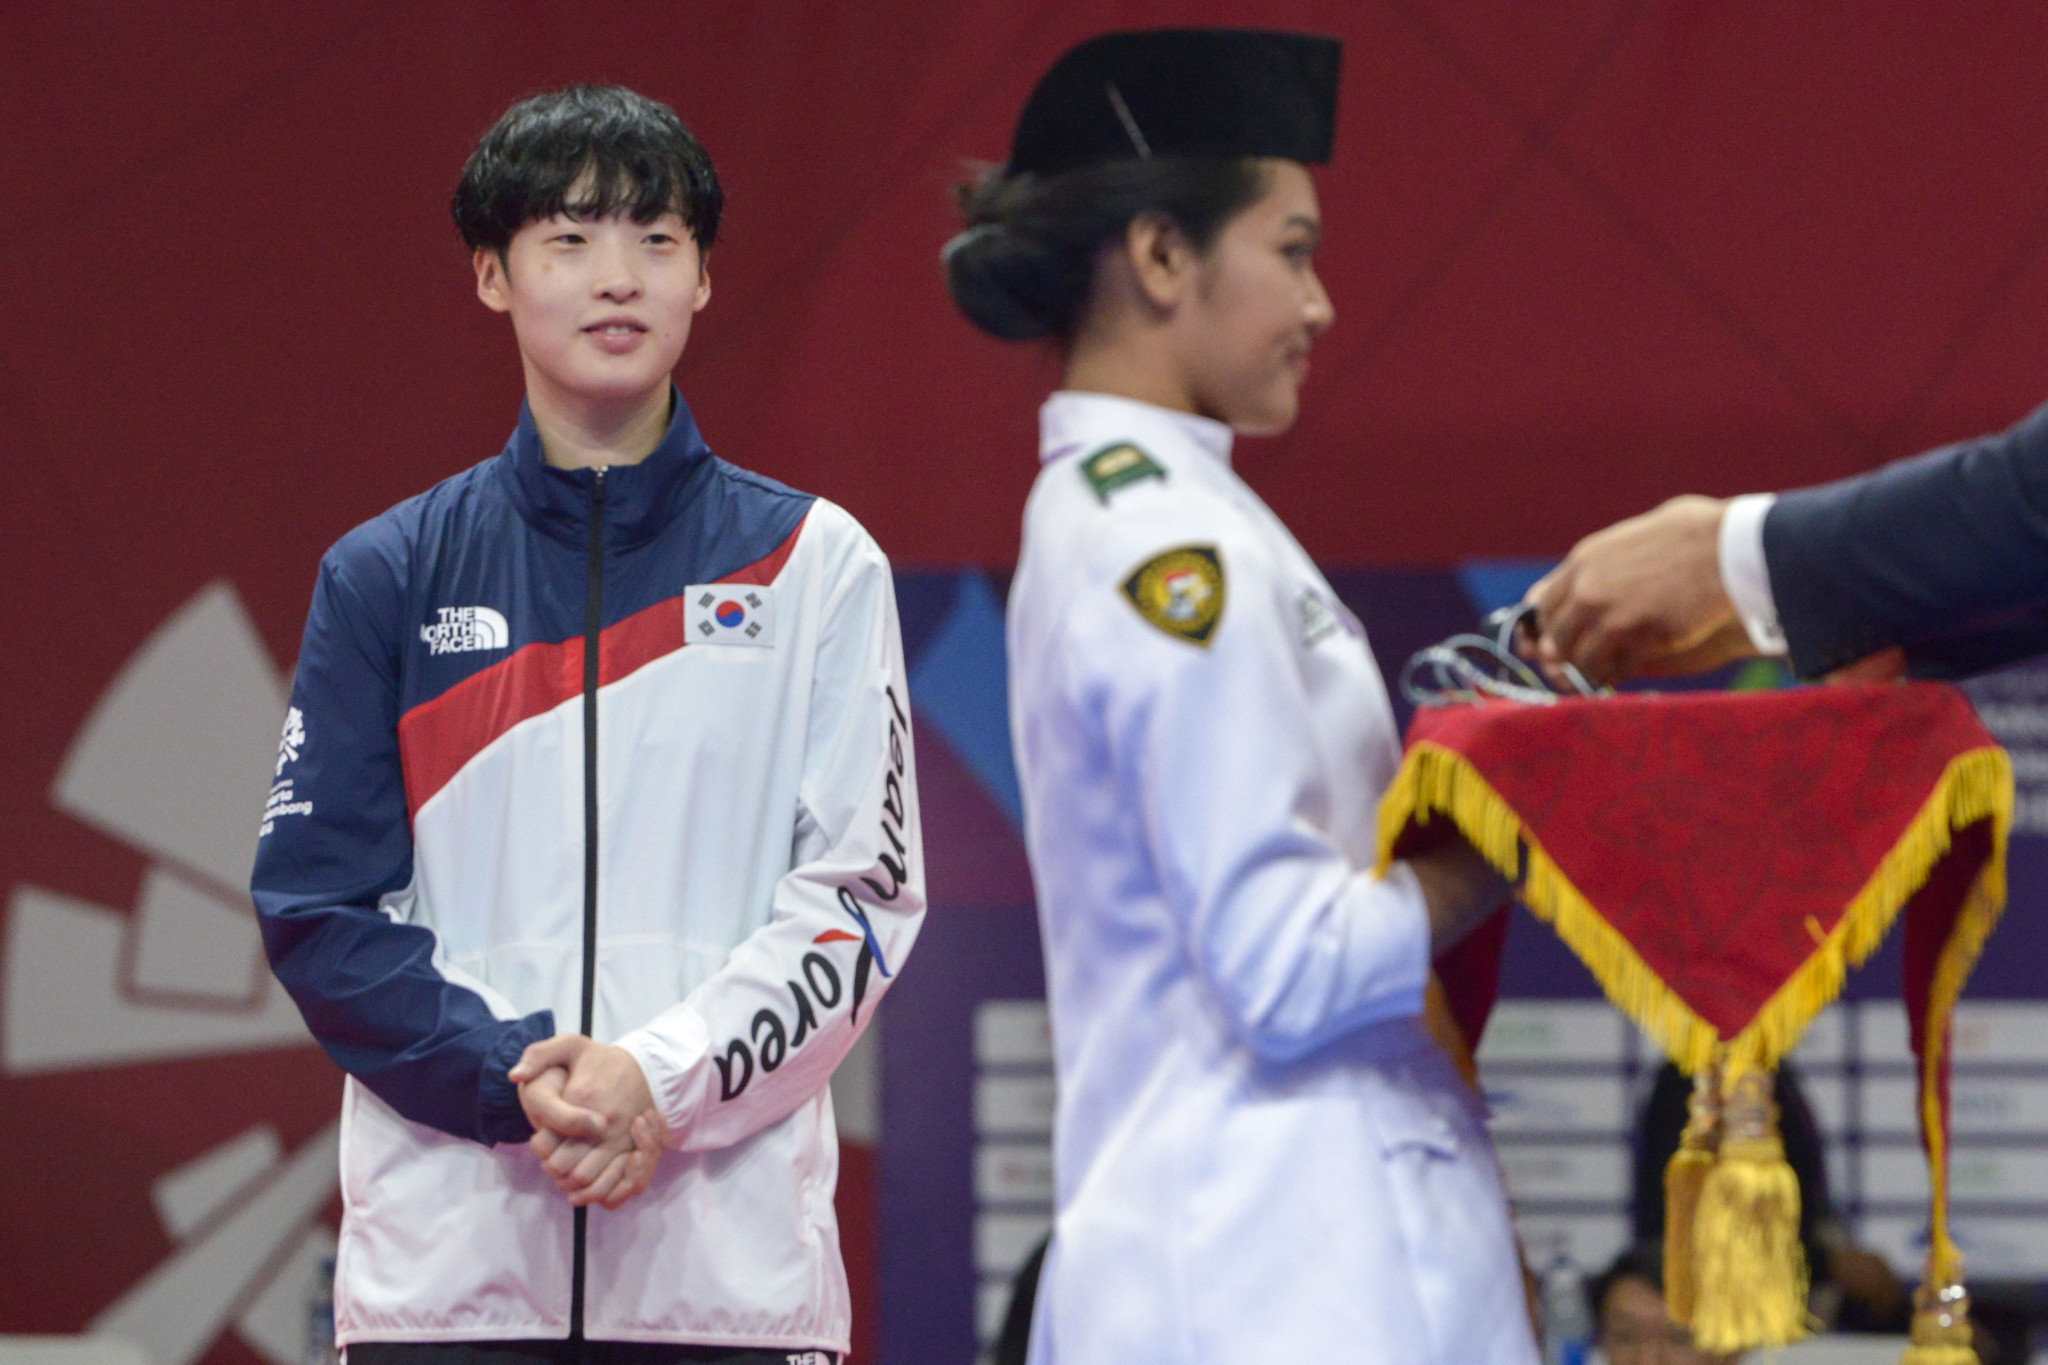 South Korea top medal standings at World Taekwondo Grand Slam Champions Series